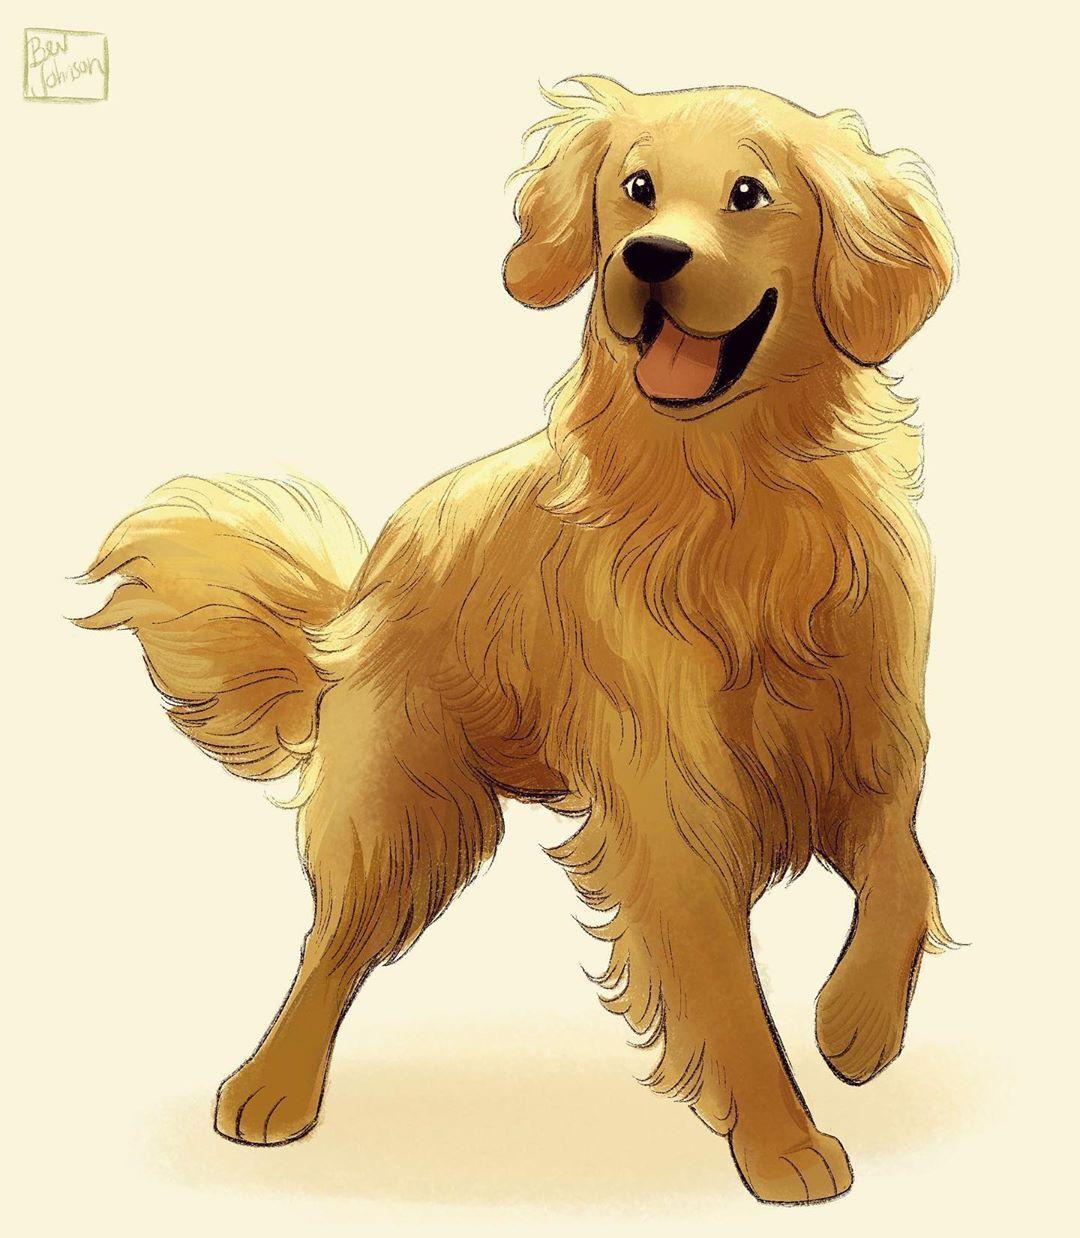 Bev Johnson On Instagram Doggust Day 31 Golden Retriever It S Been A Go Golden Retriever Art Drawing Dog Illustration Art Golden Retriever Illustration [ 1238 x 1080 Pixel ]